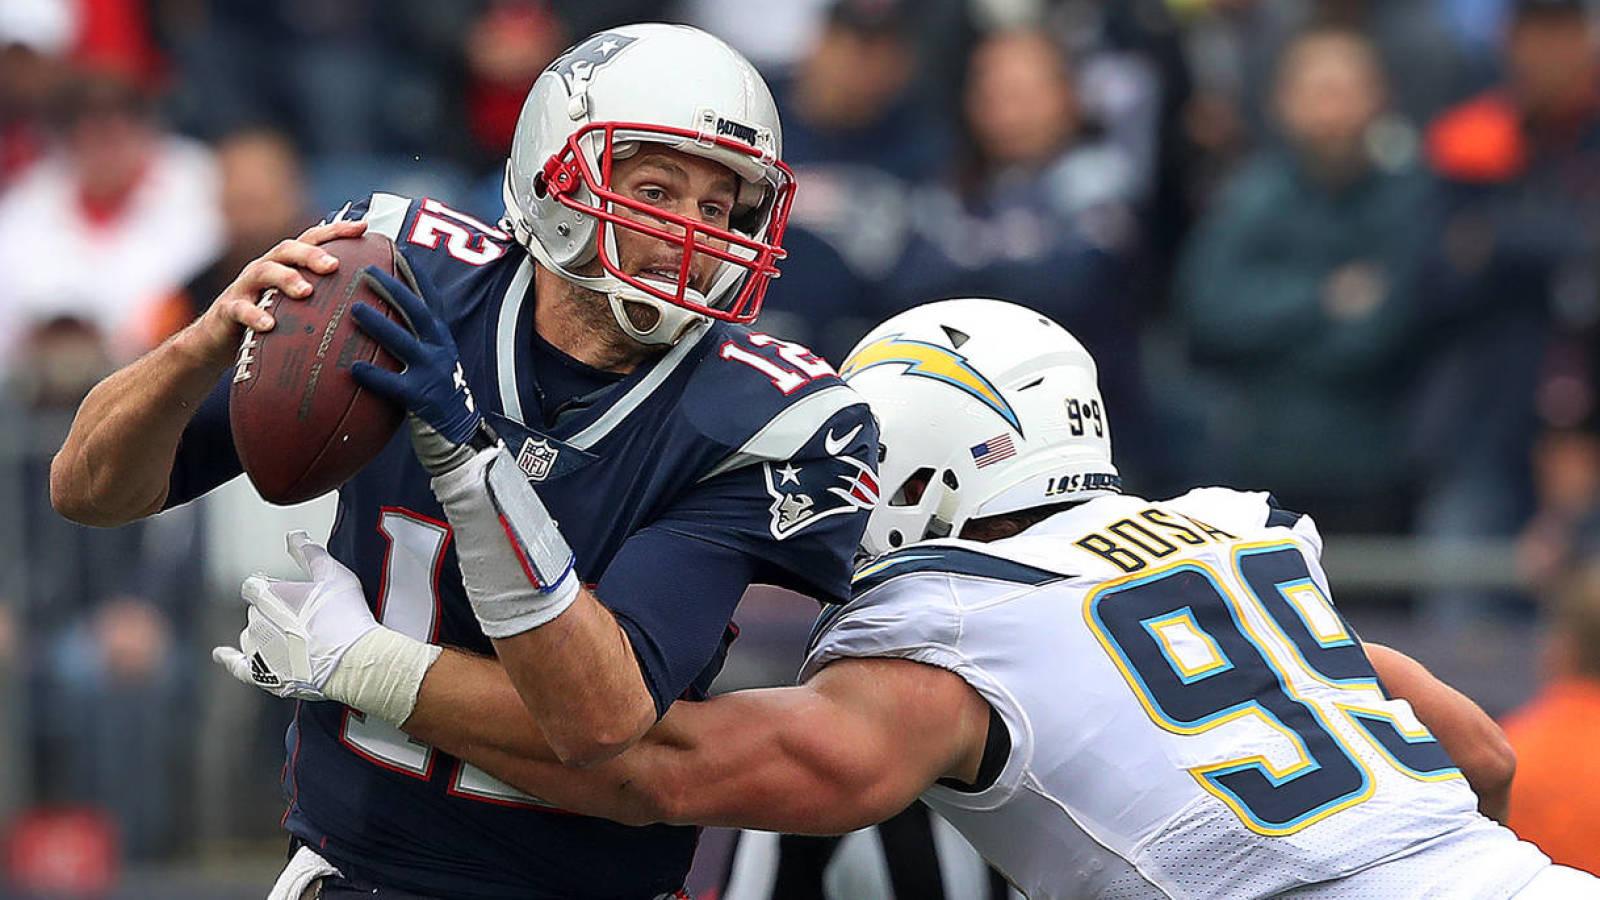 Joey Bosa sacks Tom Brady makes NFL history